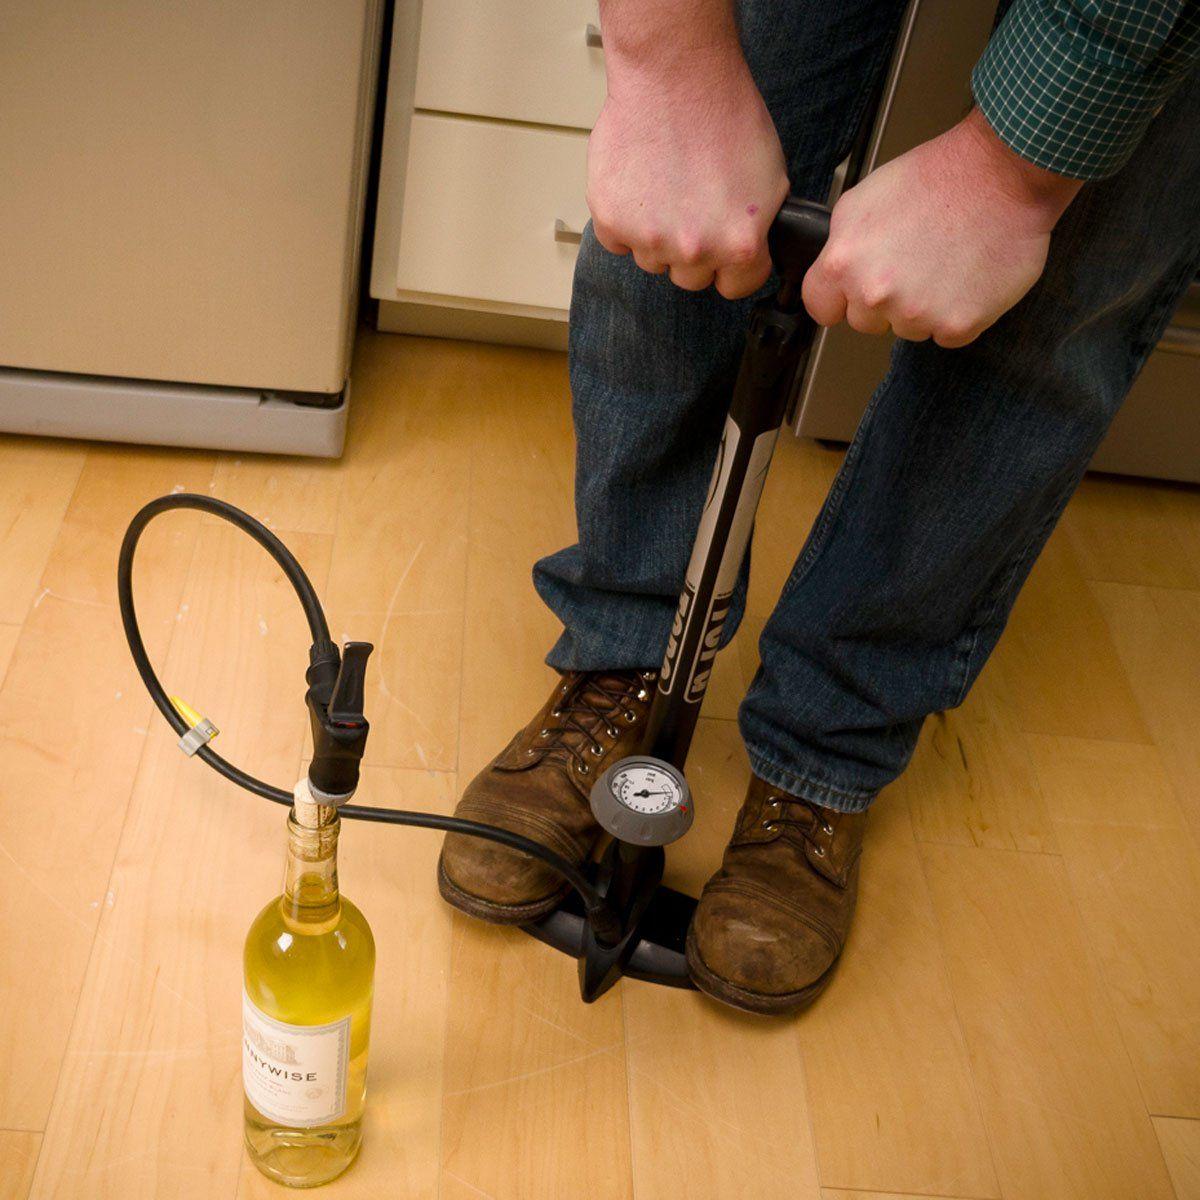 10 Ways To Open A Wine Bottle Without A Corkscrew In 2020 Wine Opener Wine Rack Wine Rack Towel Holder